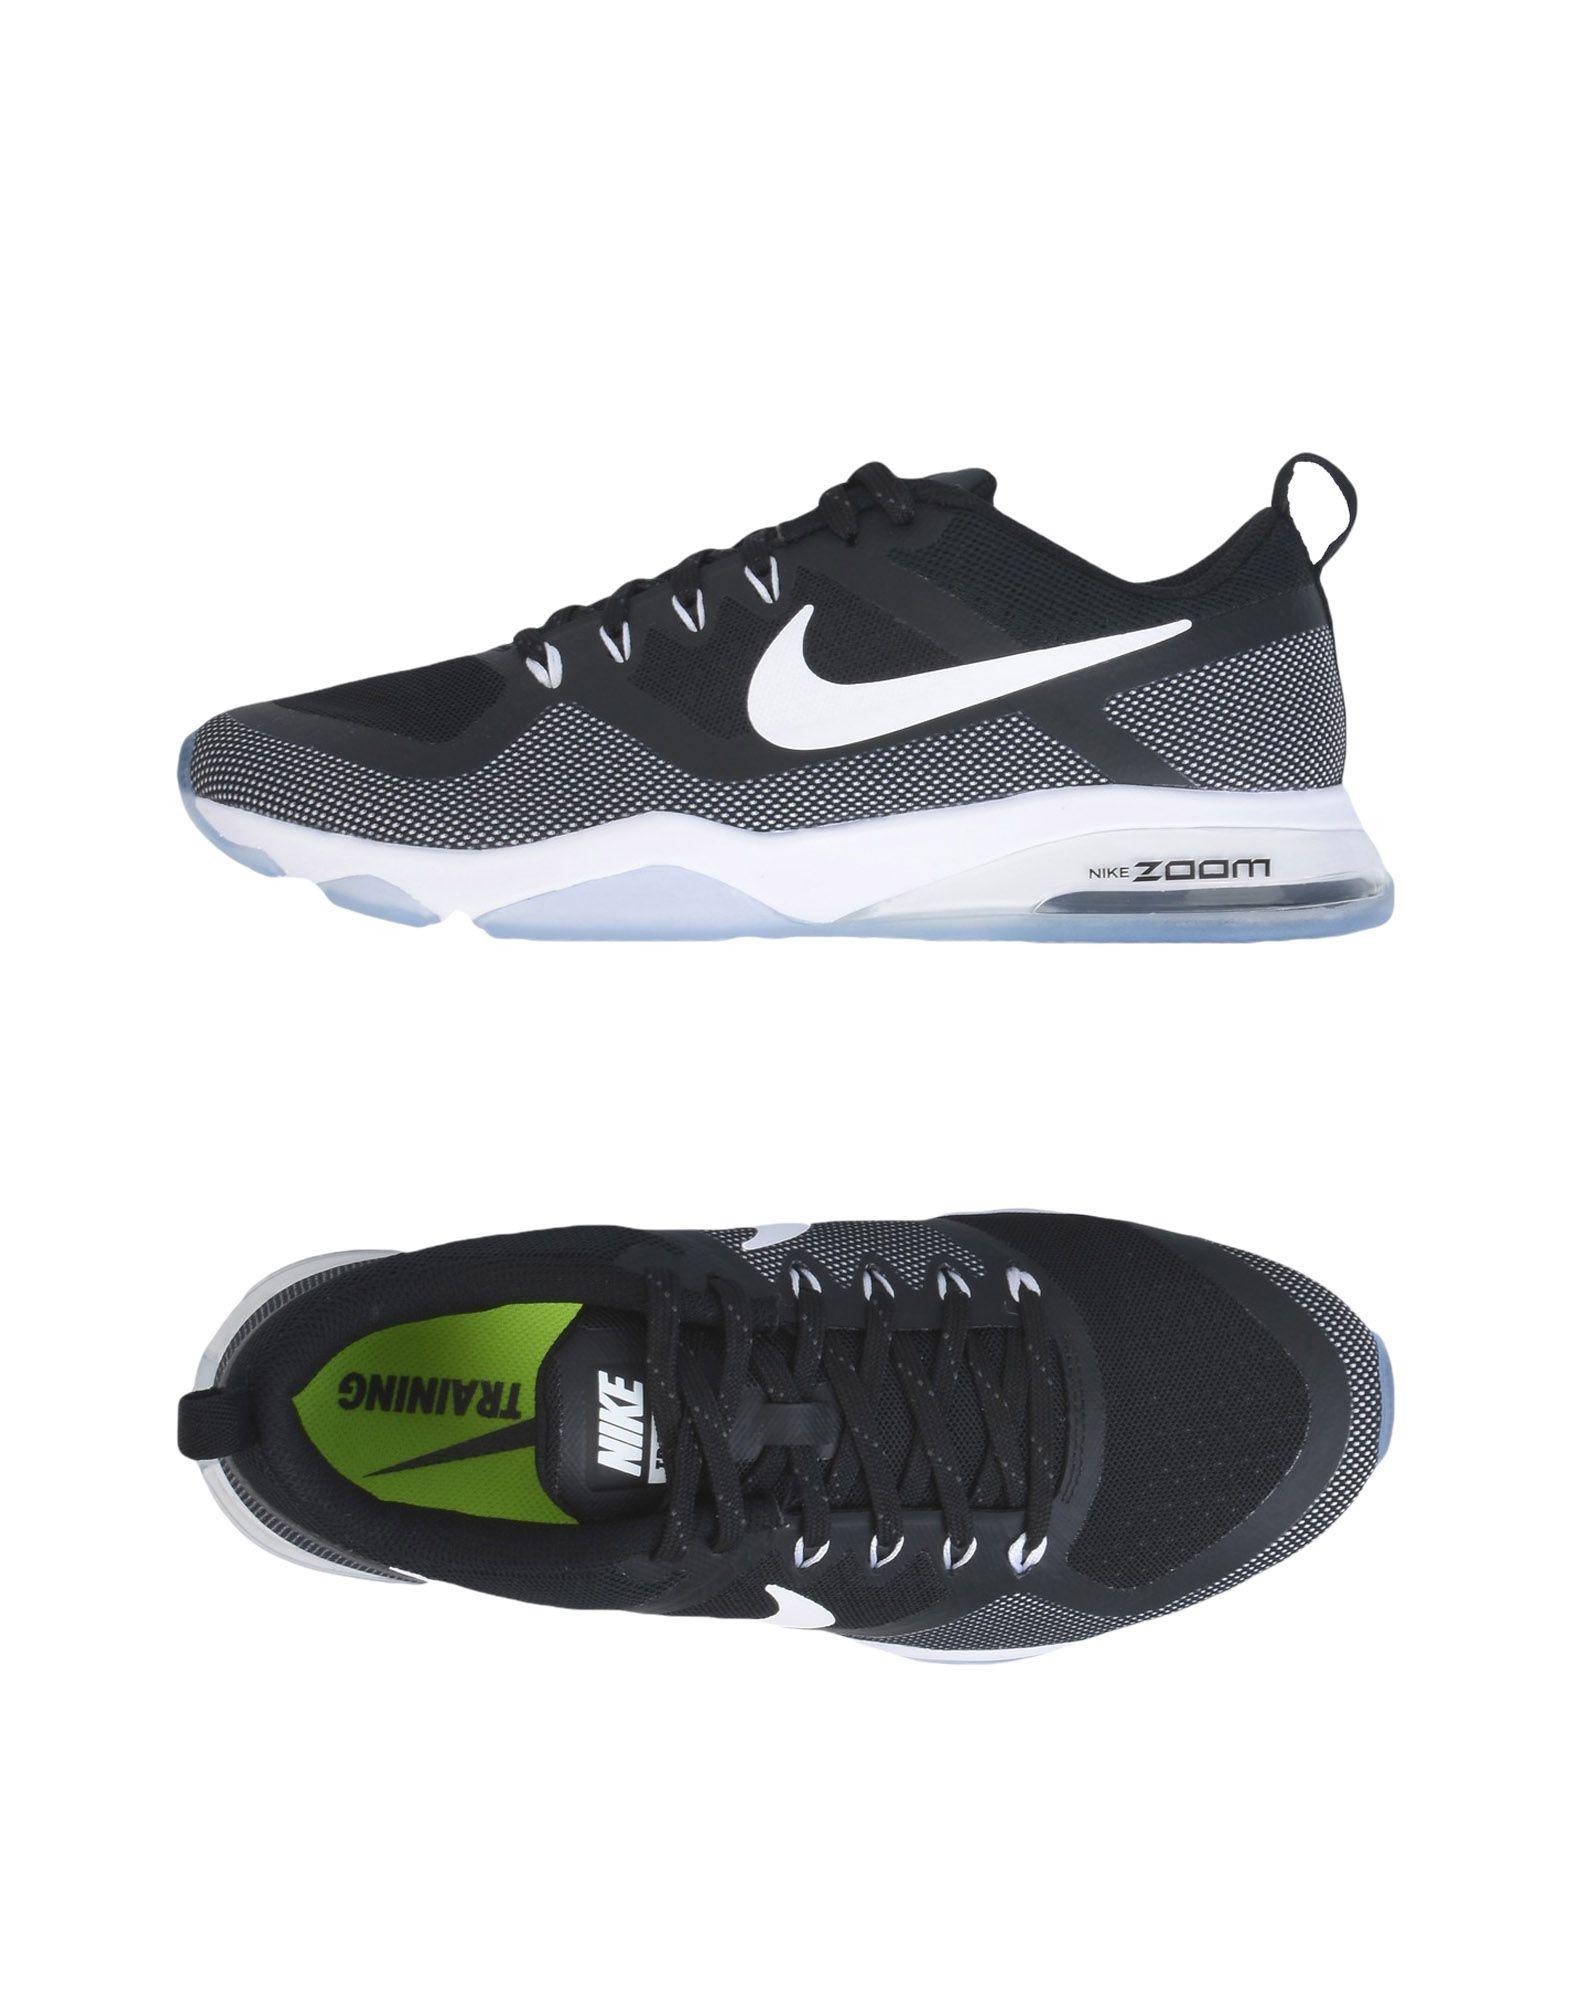 Nike   Air Zoom Fitness  beliebte 11315149VV Gute Qualität beliebte  Schuhe 91f89b